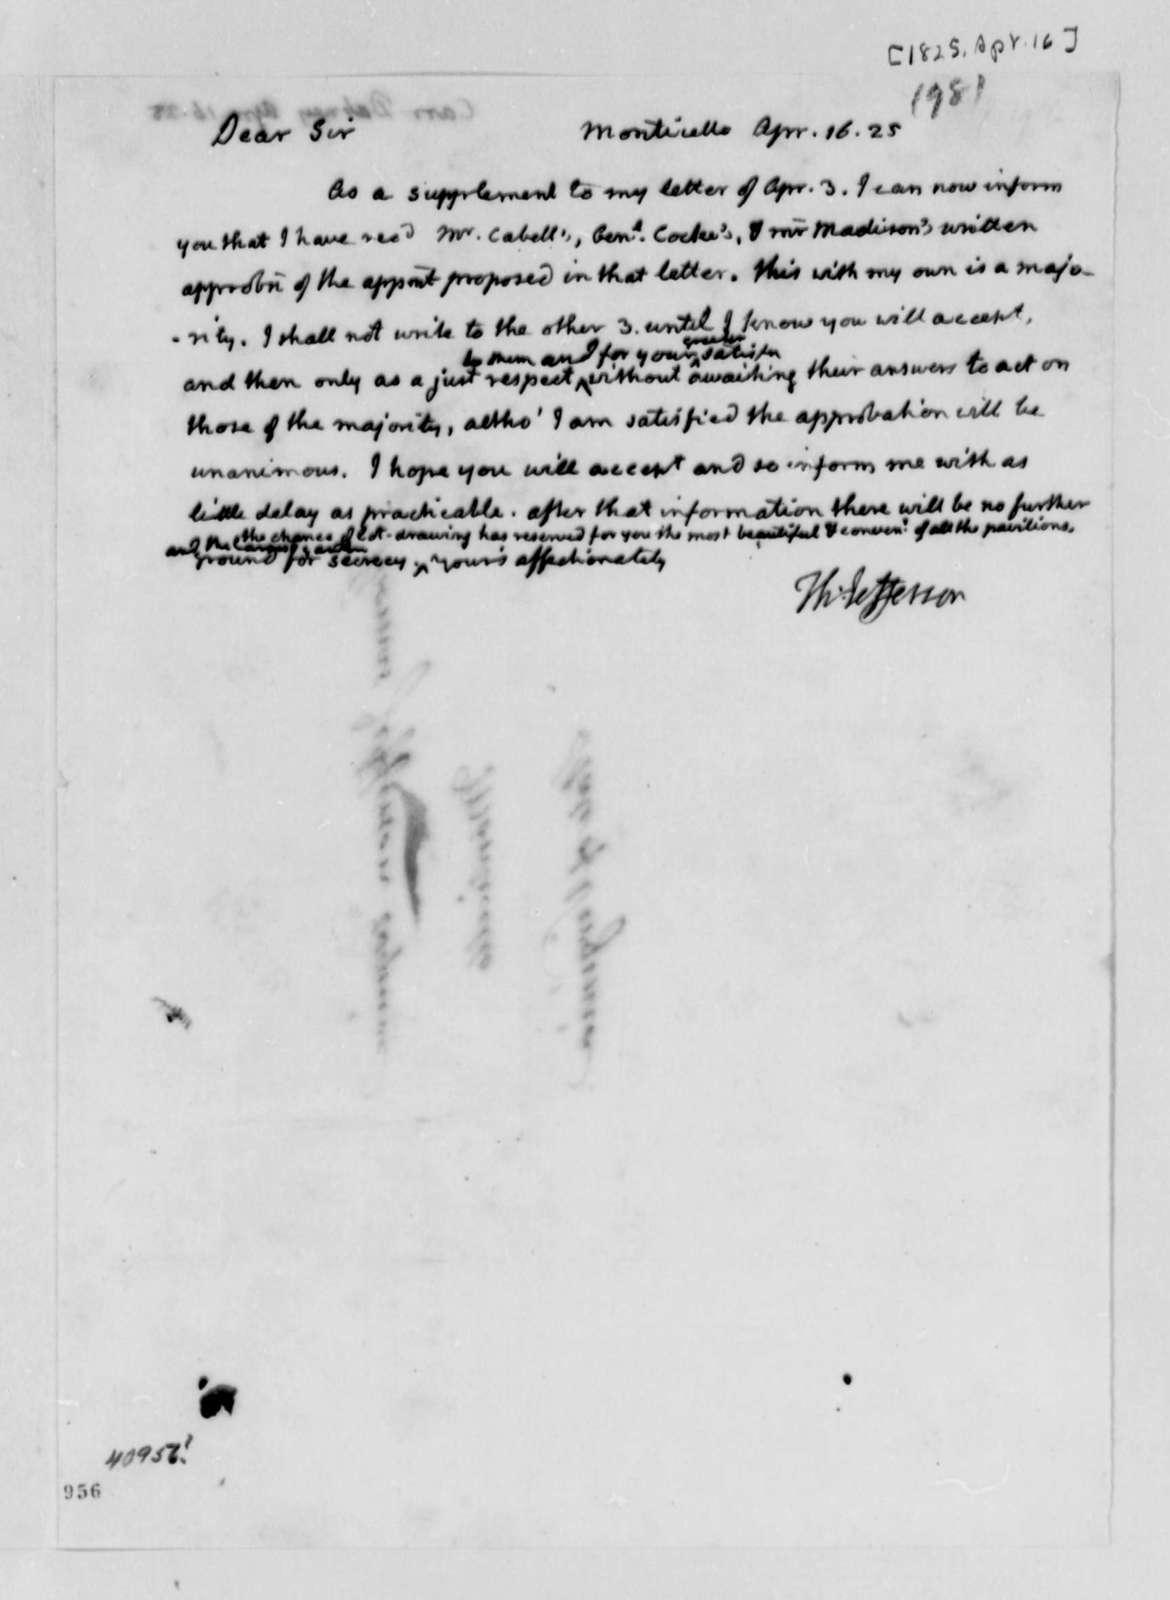 Thomas Jefferson to Dabney Carr, April 16, 1825